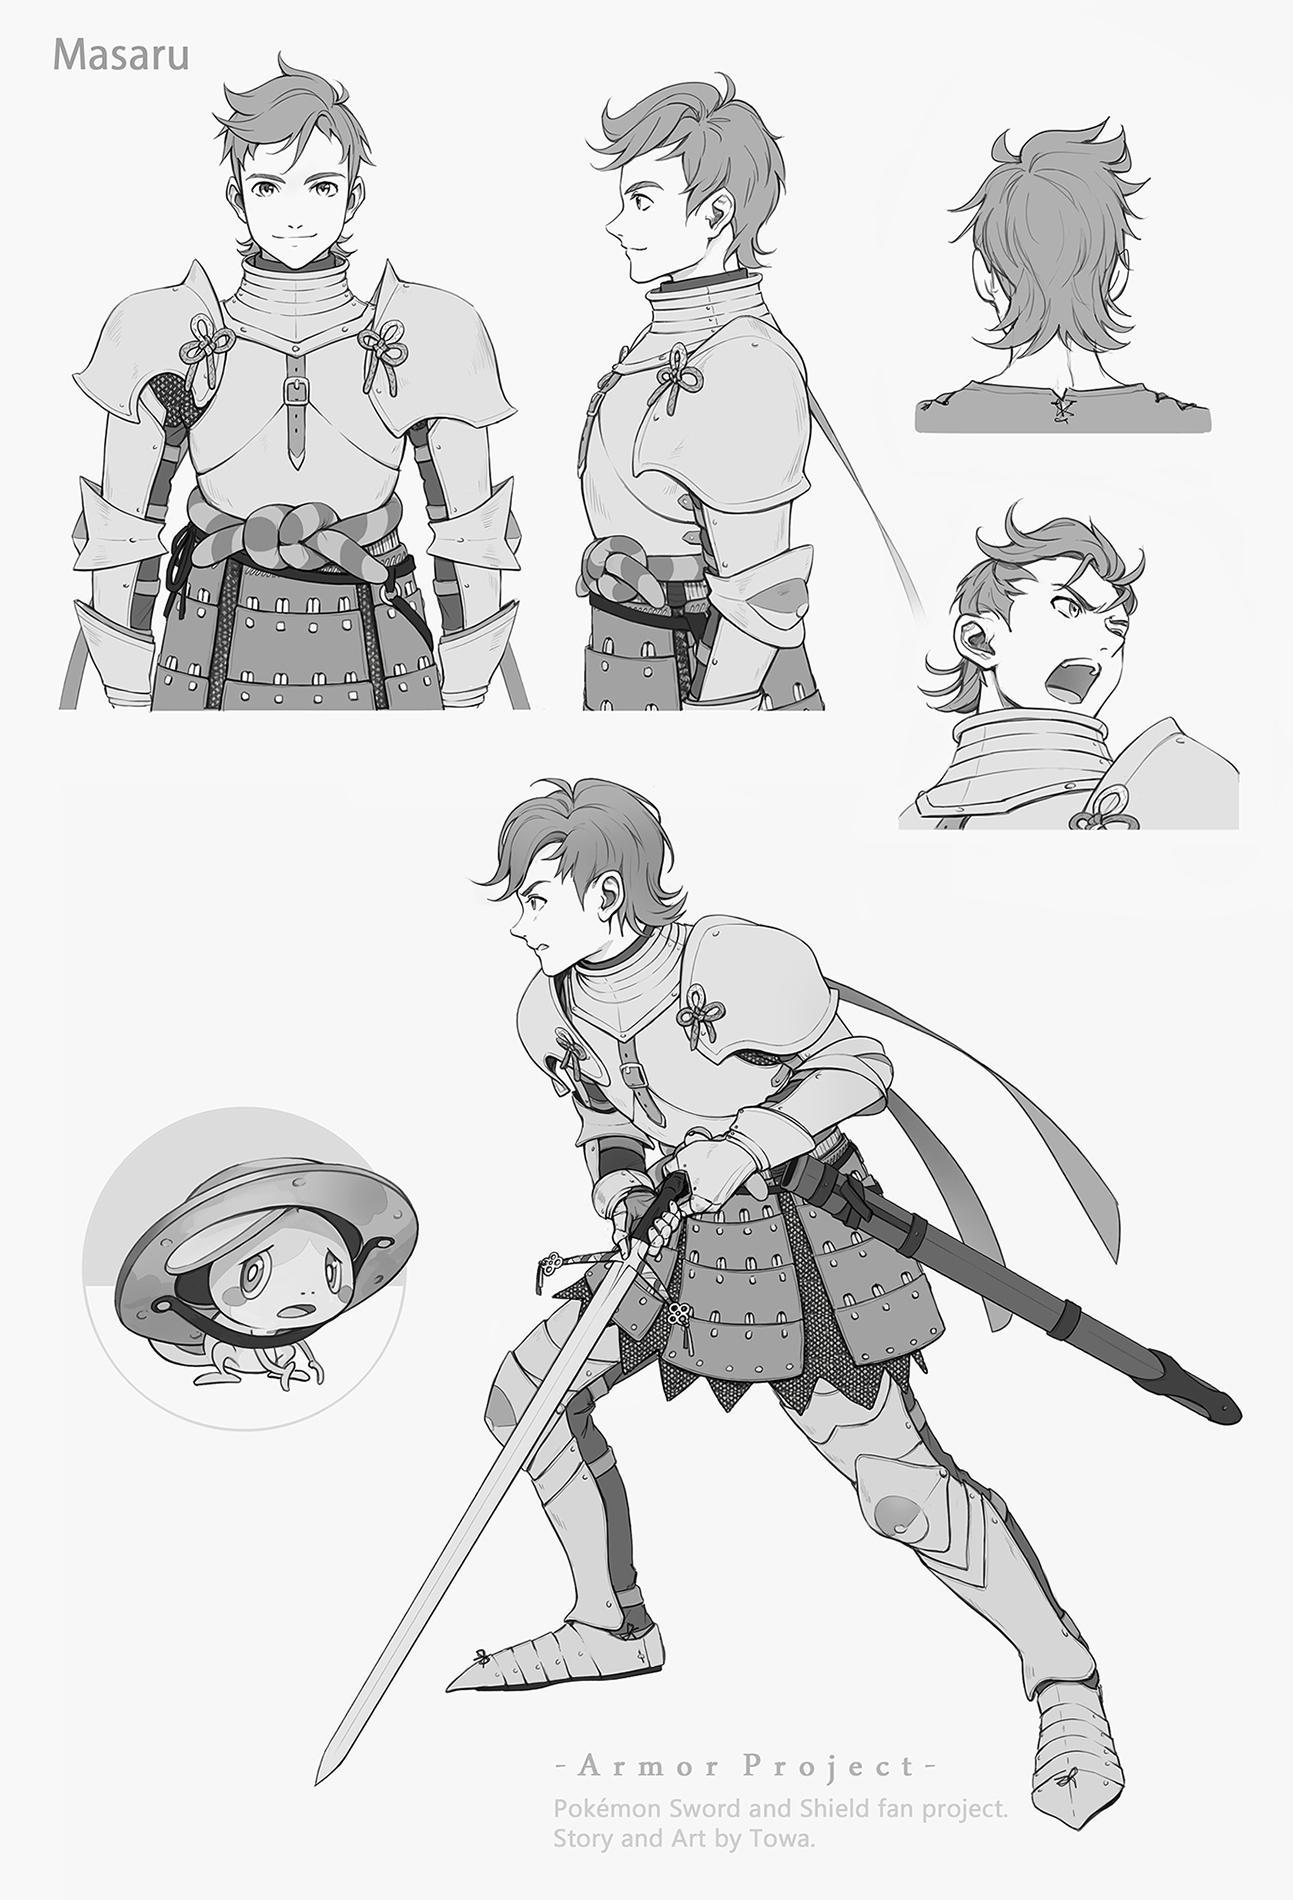 Pokémon-Zeichnung: Masaru (Armor Project)